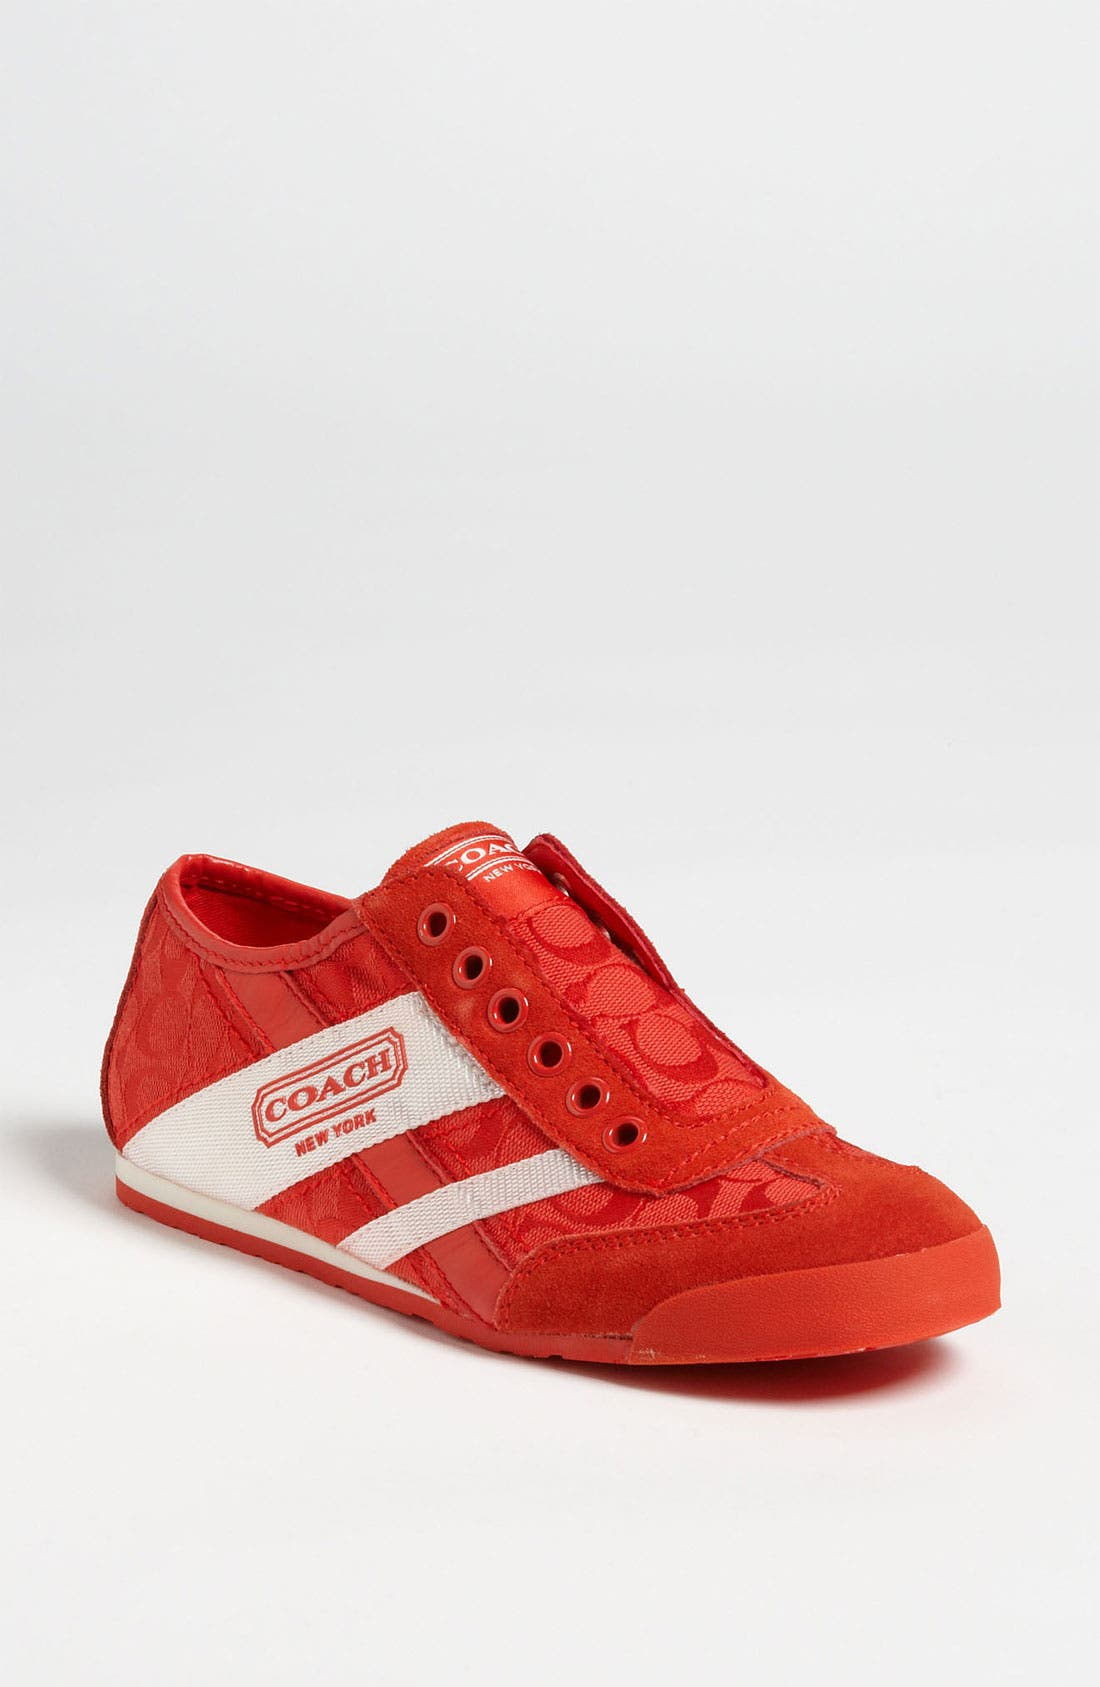 Alternate Image 1 Selected - COACH 'Yanna' Sneaker